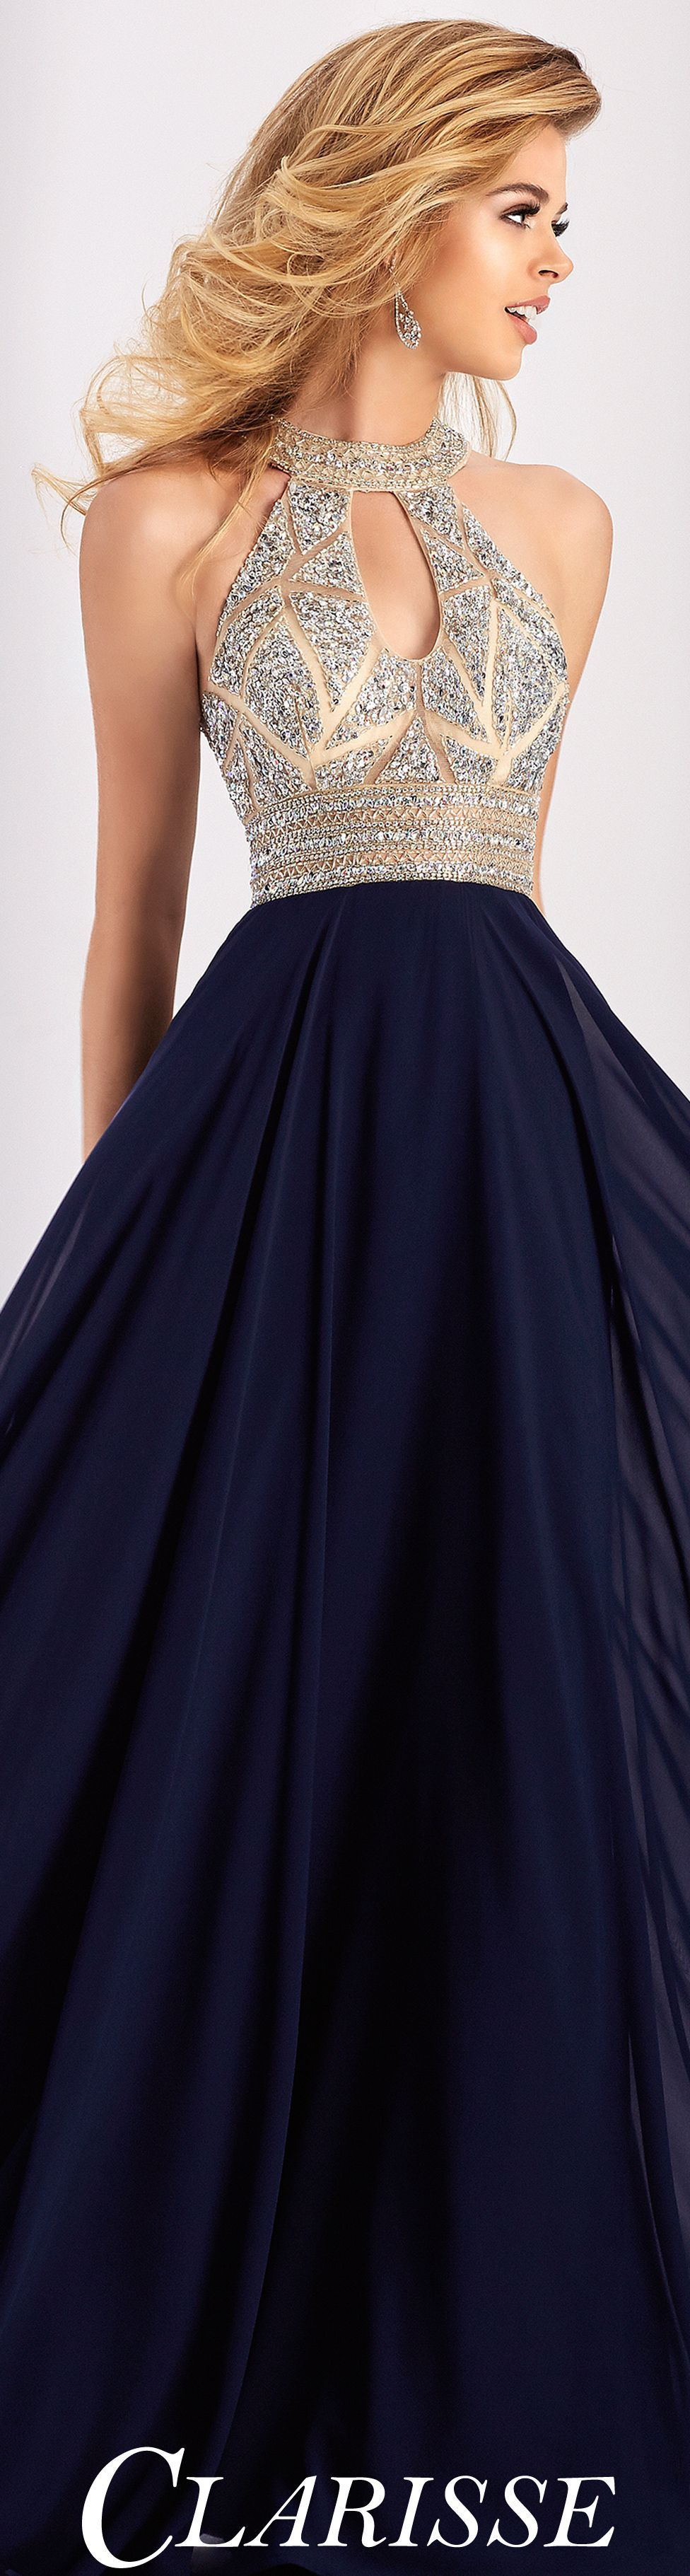 Clarisse prom dress chiffon prom dress featuring a halter